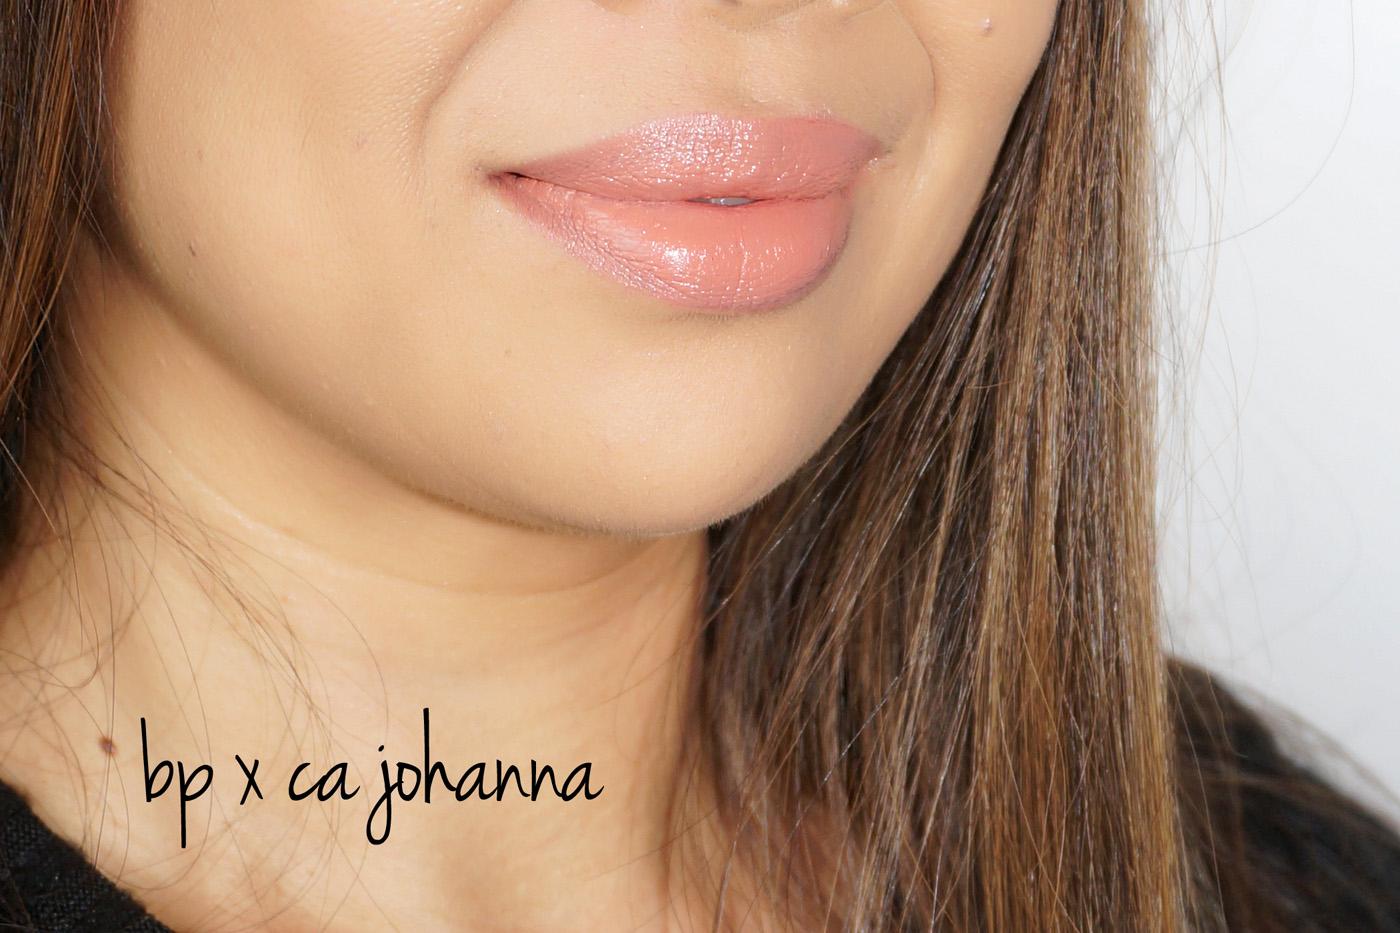 Christian Audette x Beauty Professor Lipstick in Johanna review